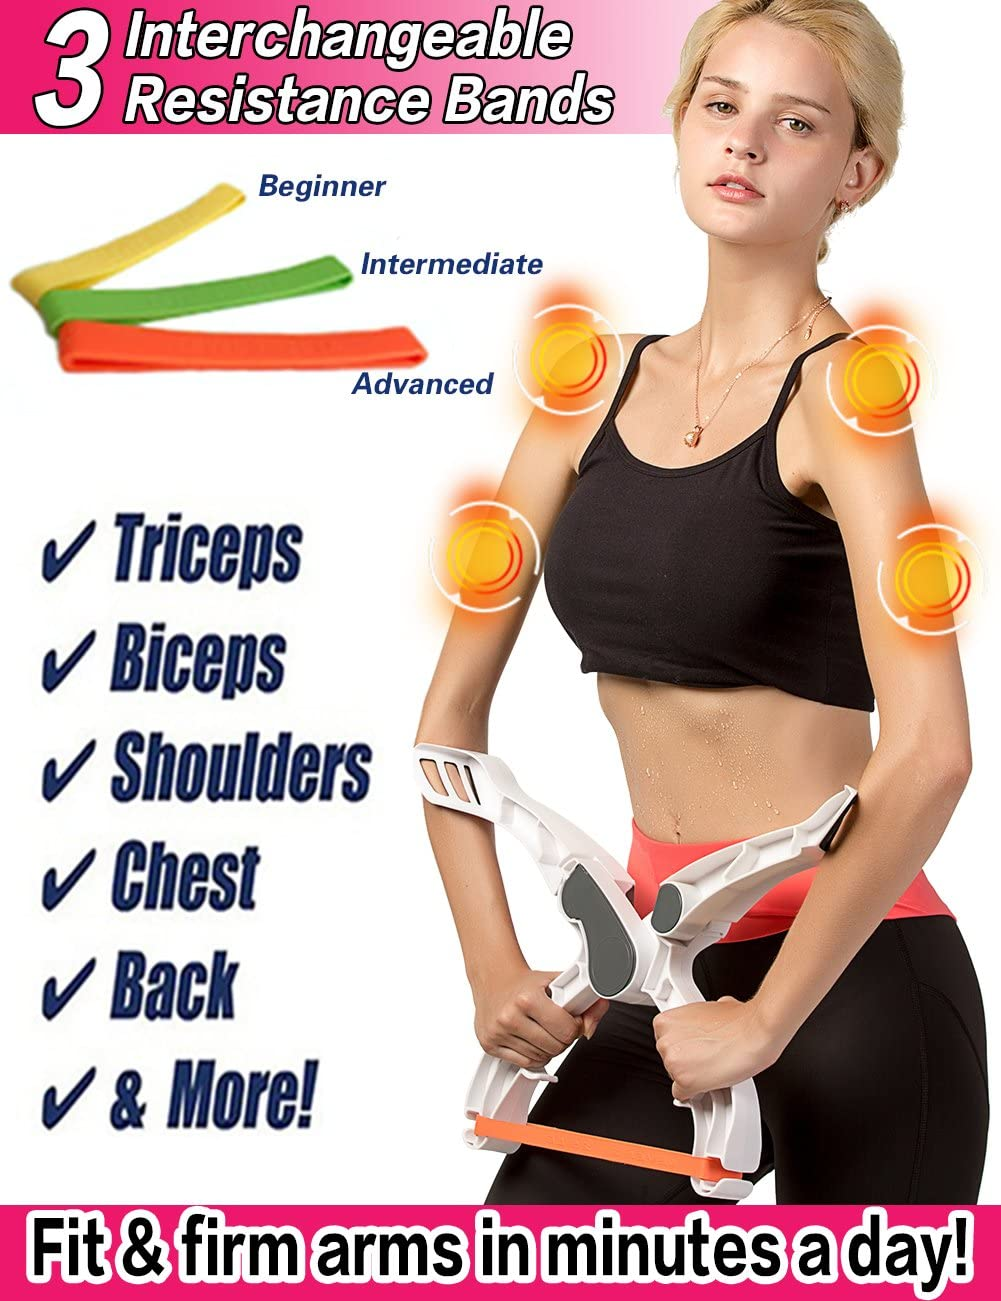 Useful Armor Upper Body Hand Grip Strength Brawn Training Device Wonder Arm Forearm Wrist Force Fitness Gym Exercise Equipment